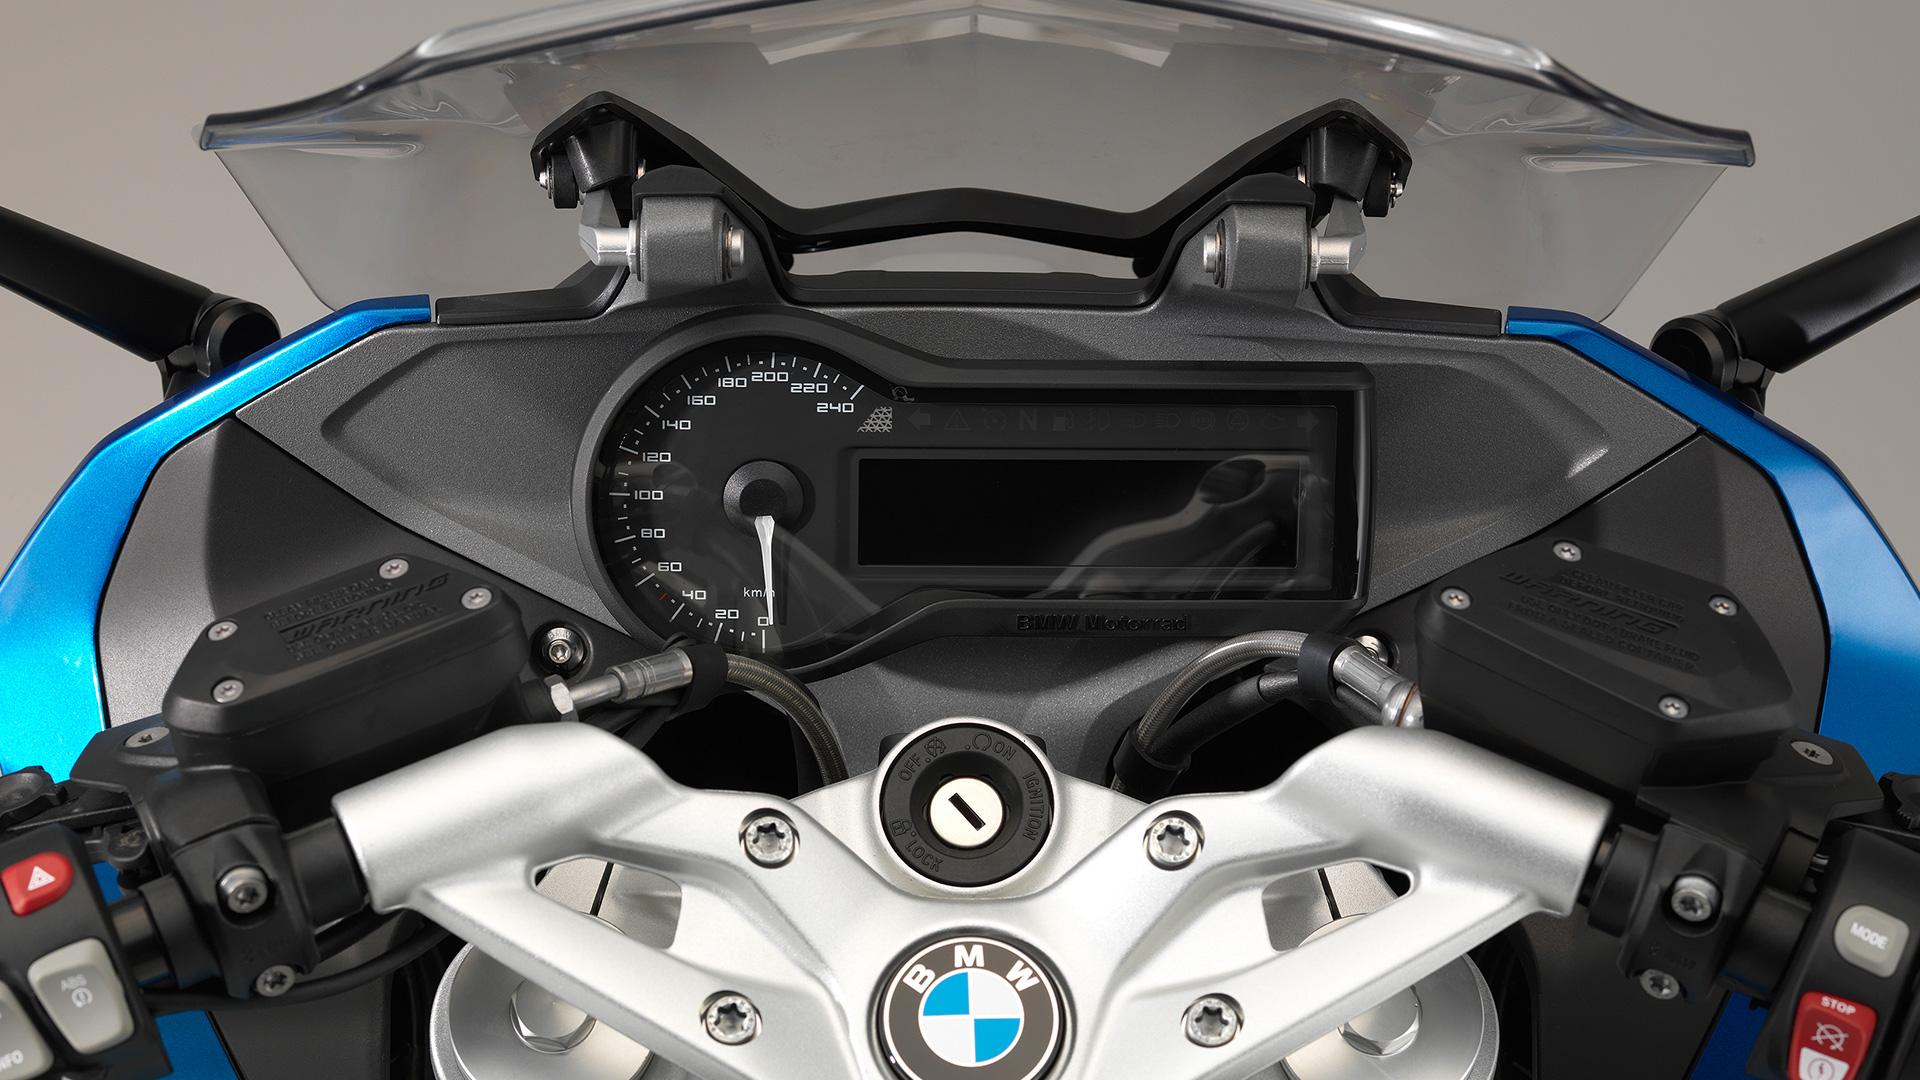 BMW R 1200 2017 RS